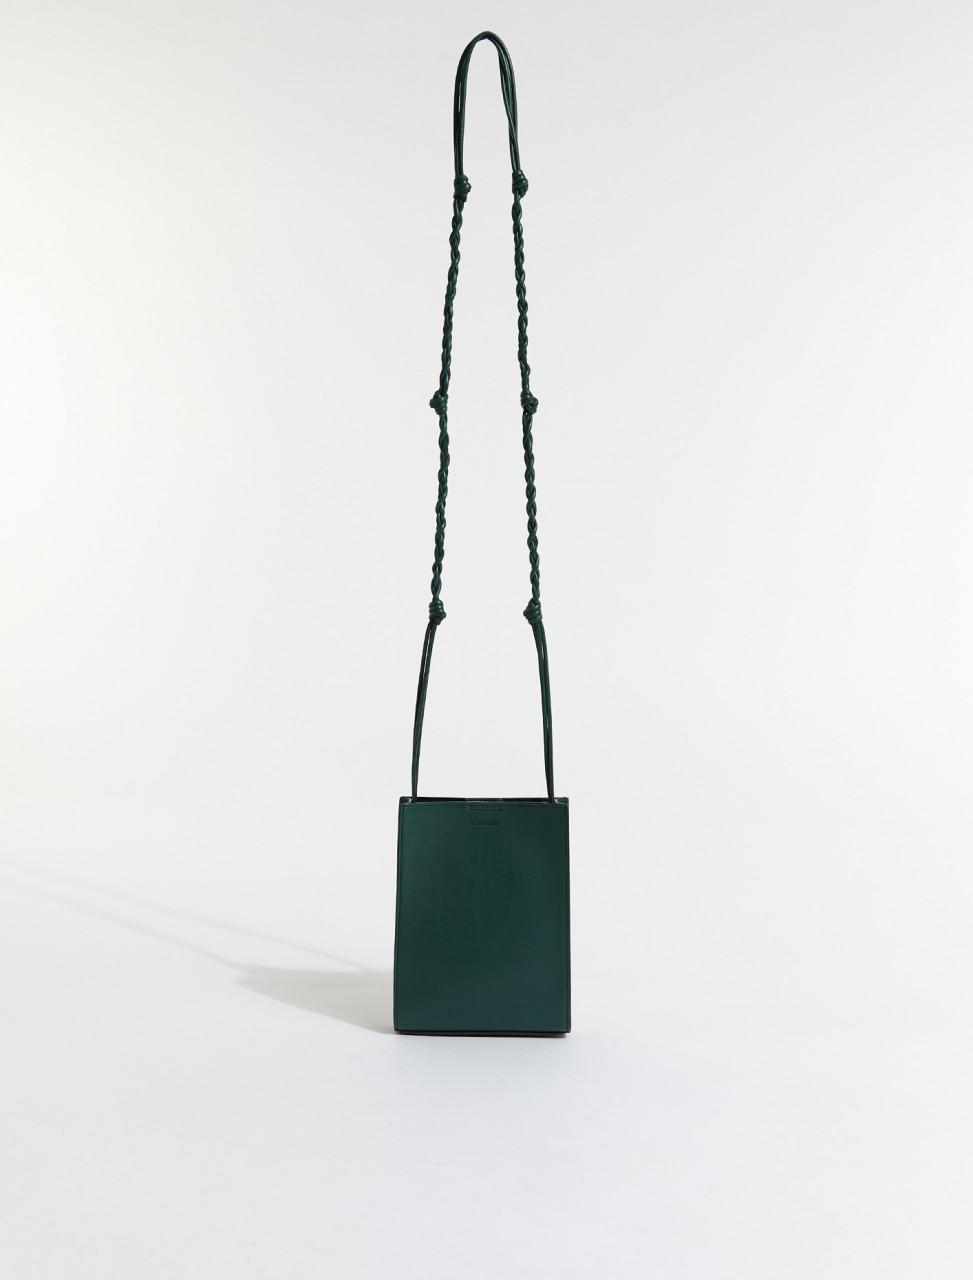 JSMS853173-MSB00035N-308 JIL SANDER TANGLE SMALL BAG IN DARK GREEN